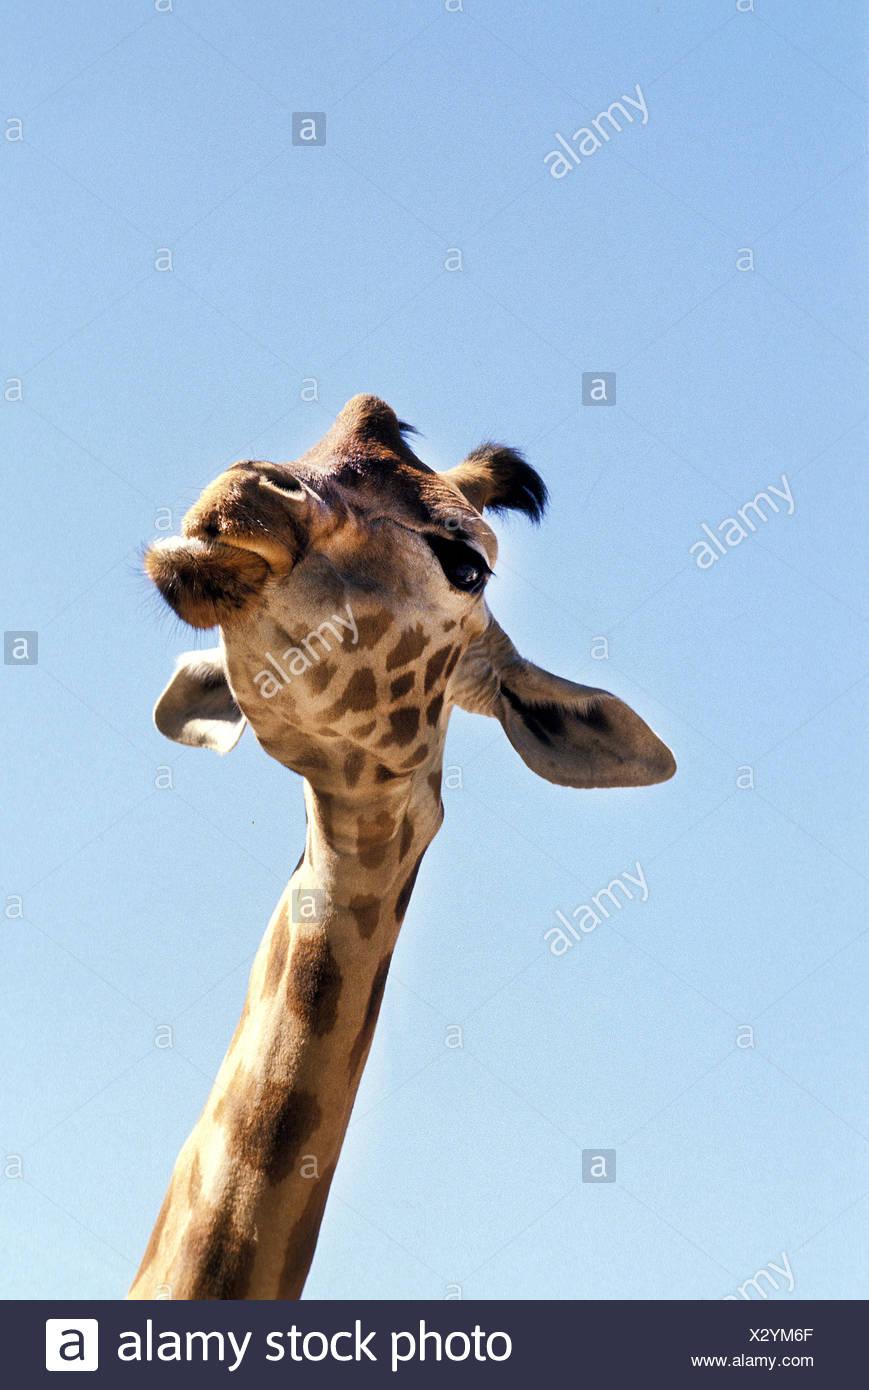 Rothschild's Giraffe,  giraffa camelopardalis rothschildi - Stock Image